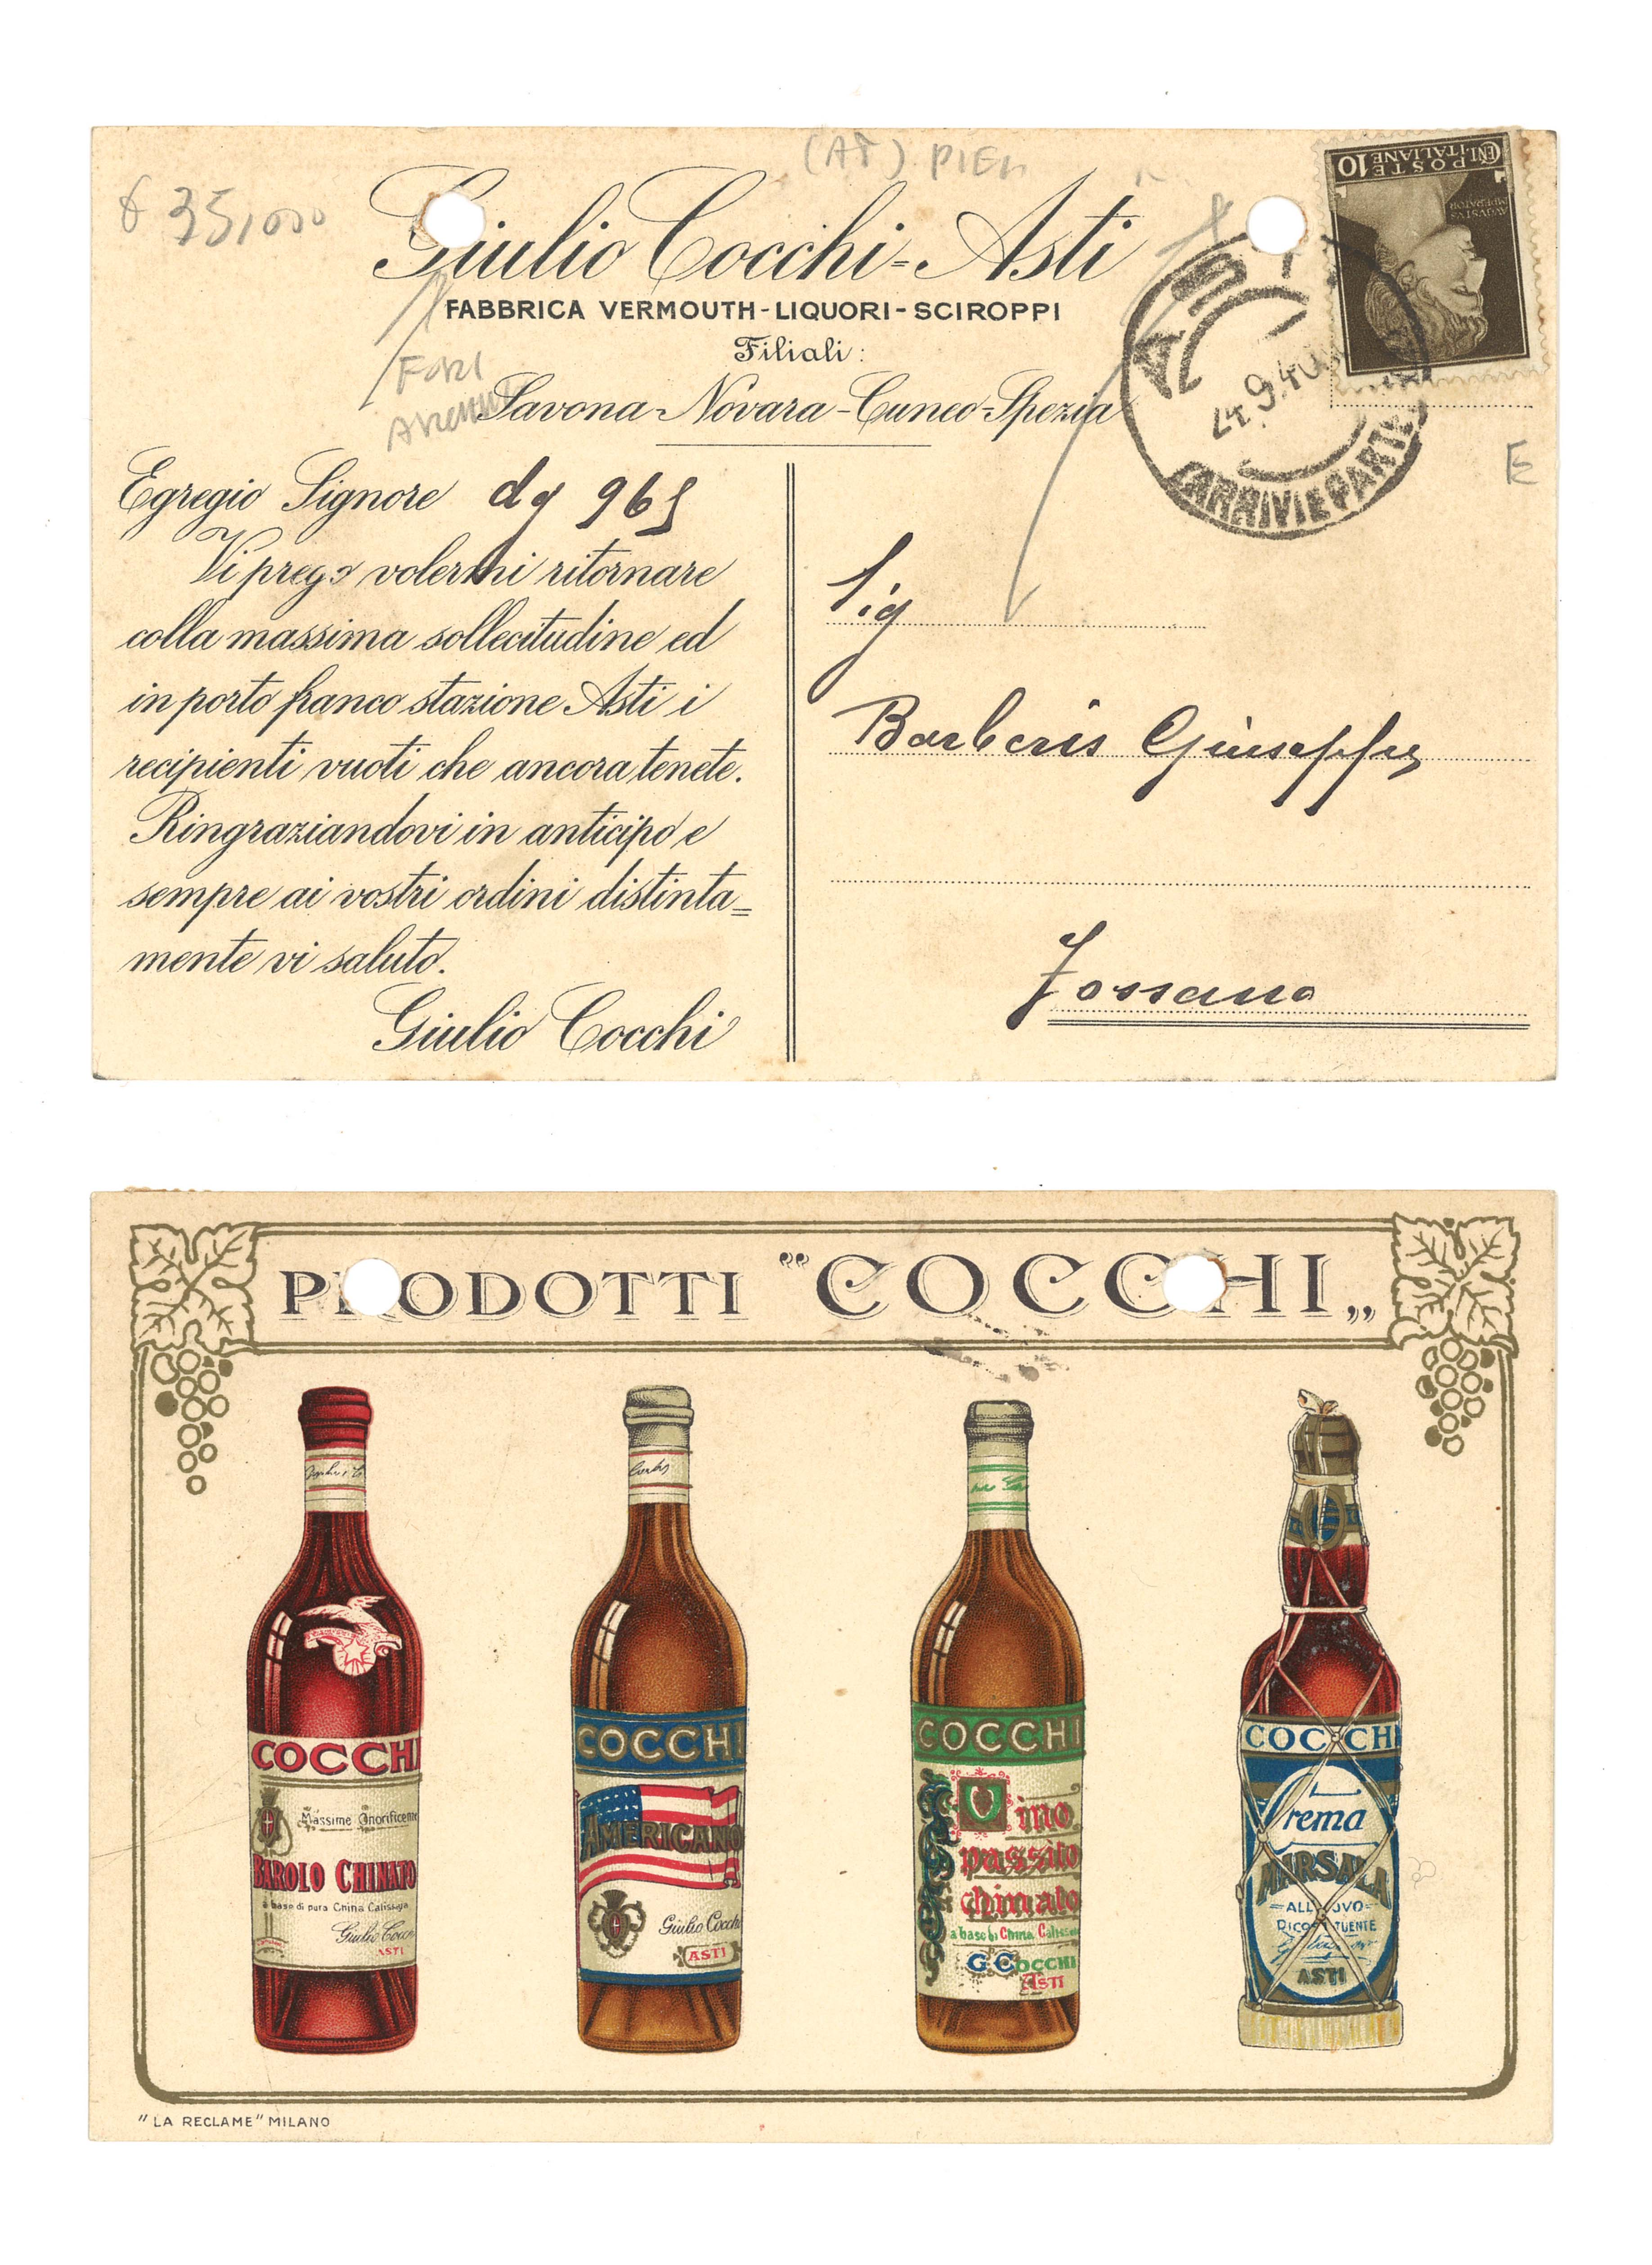 Cartolina Cocchi